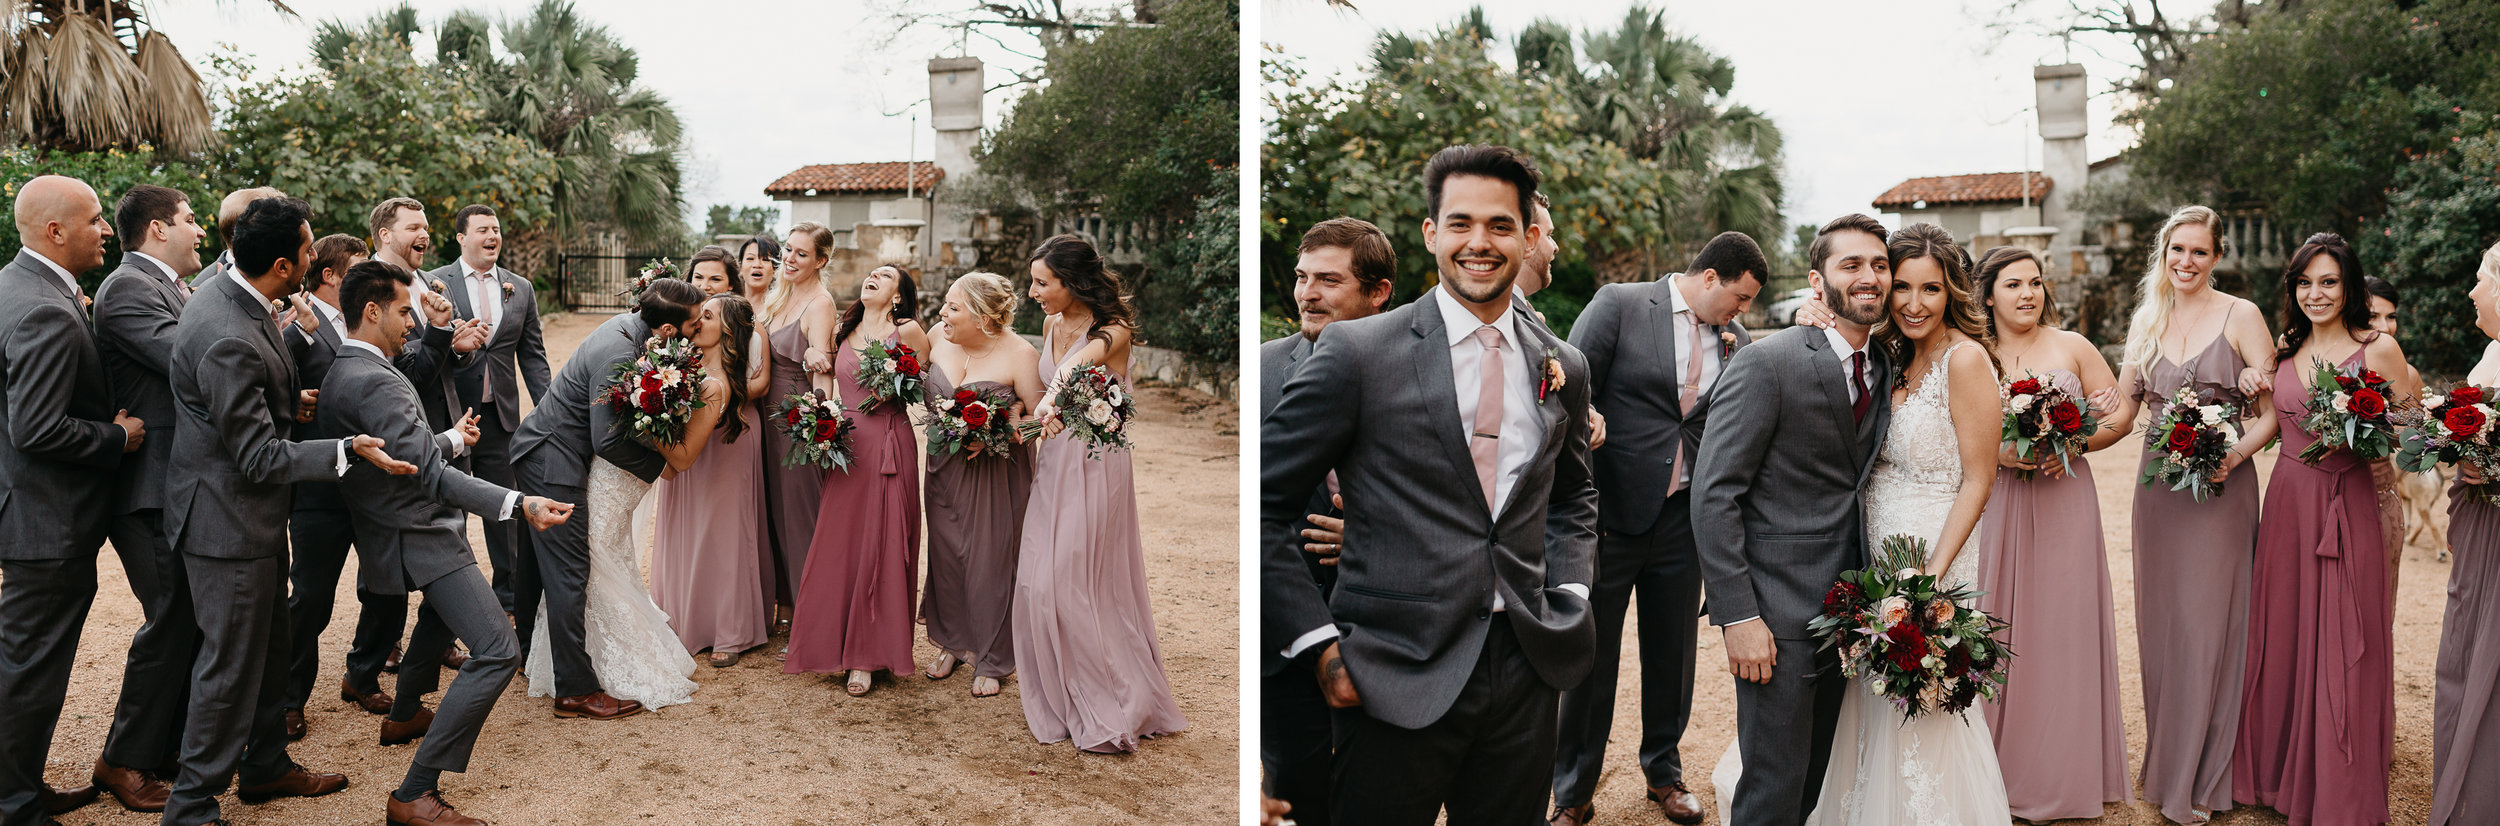 austin texas wedding photogapher elopement photographer villa antonia austin 22.jpg